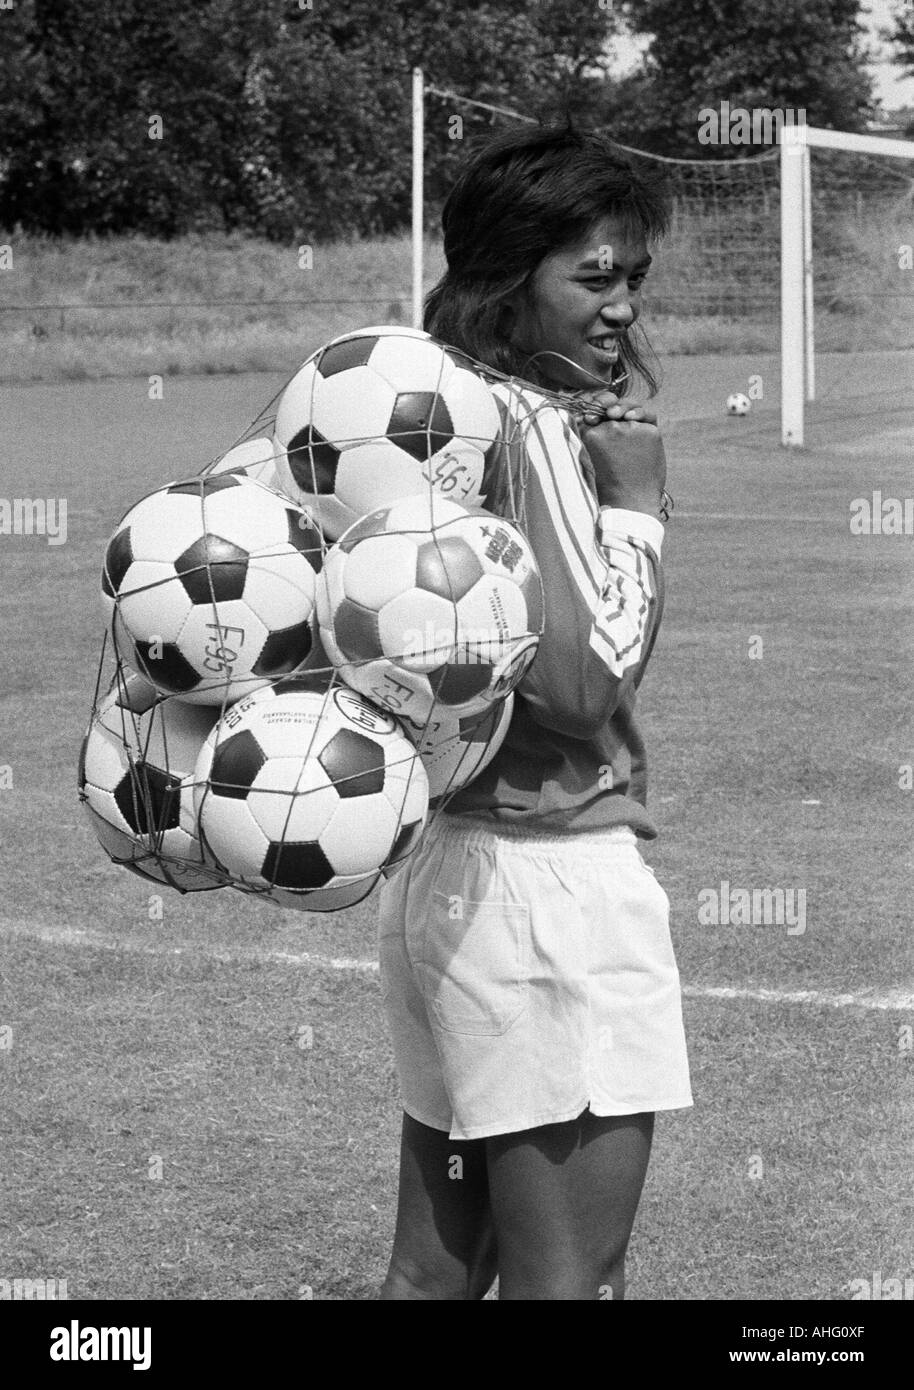 football, Bundesliga, Fortuna Duesseldorf, presentation of the team for the new saison 1975/1976, press photo shooting, portrait of Johannes Lalopua - Stock Image